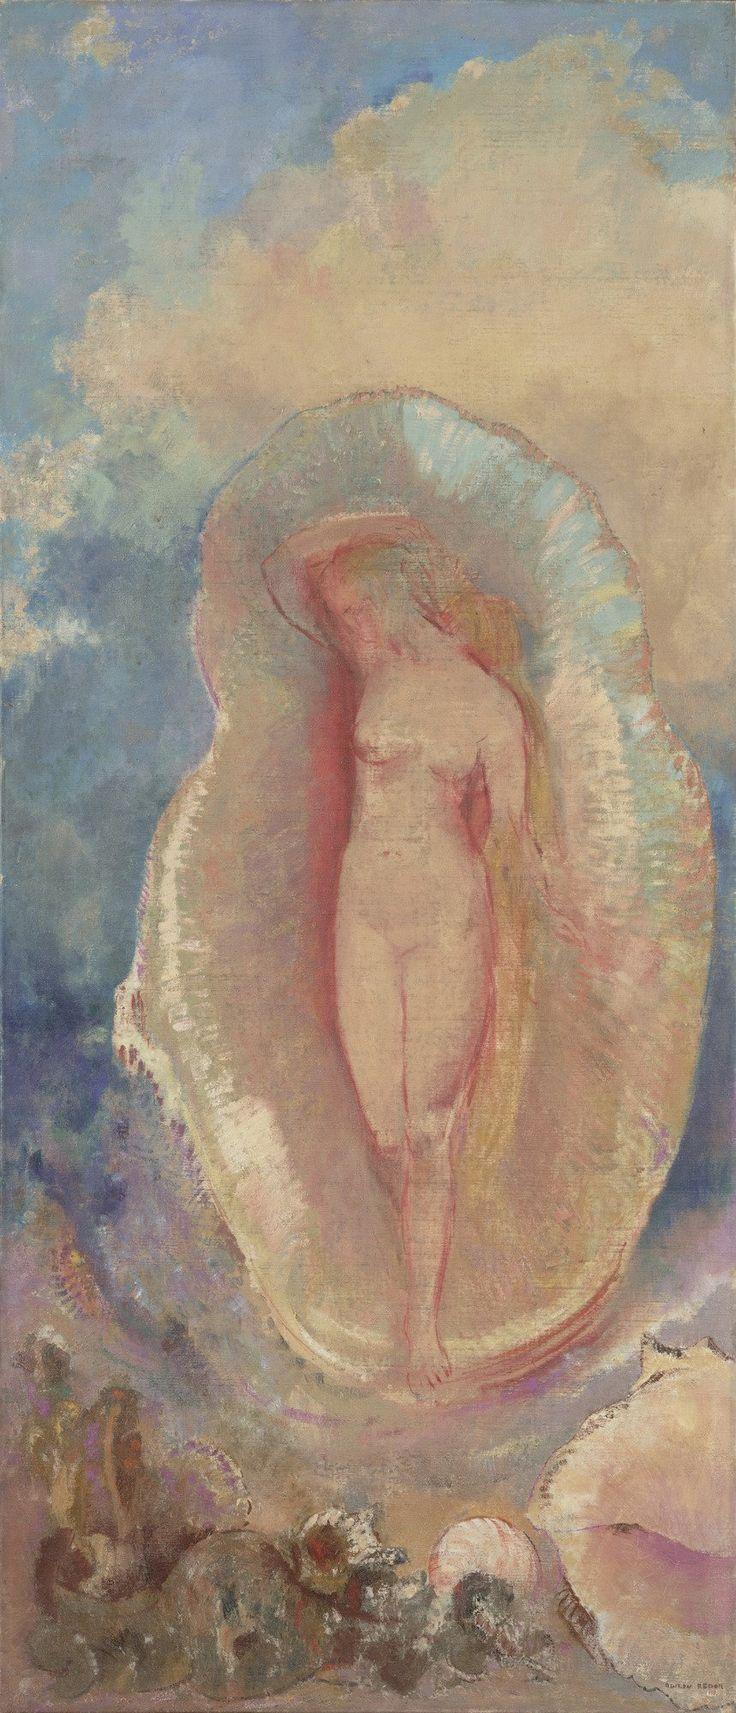 "The Birth of Venus (ca. 1912) by Odilon Redon (b. Bertrand-Jean Redon, 20 April 1840; Bordeaux, France – d. 6 July 1916; Paris, France) Oil on canvas, 56 ⅜ × 24 ⅝"" (143.2 × 62.5 cm) Not on view, MoMA (Museum of Modern Art), NYC https://en.wikipedia.org/wiki/Odilon_Redon"